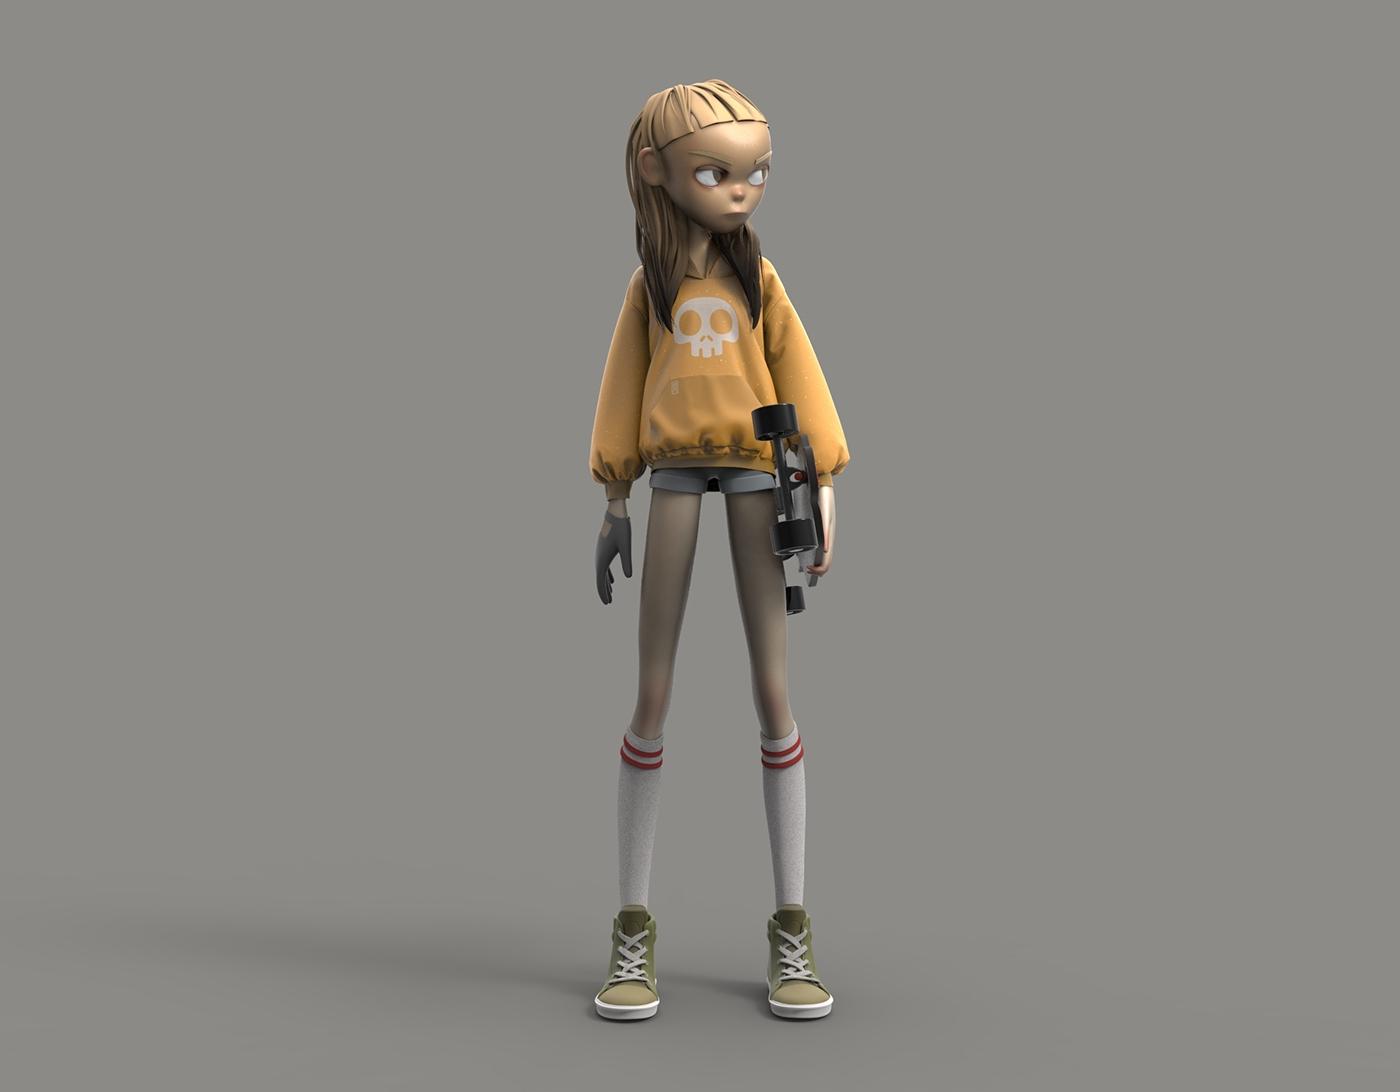 Milica Martic Digital Portrait Of A 3d Fashion Designer Article Cgsociety